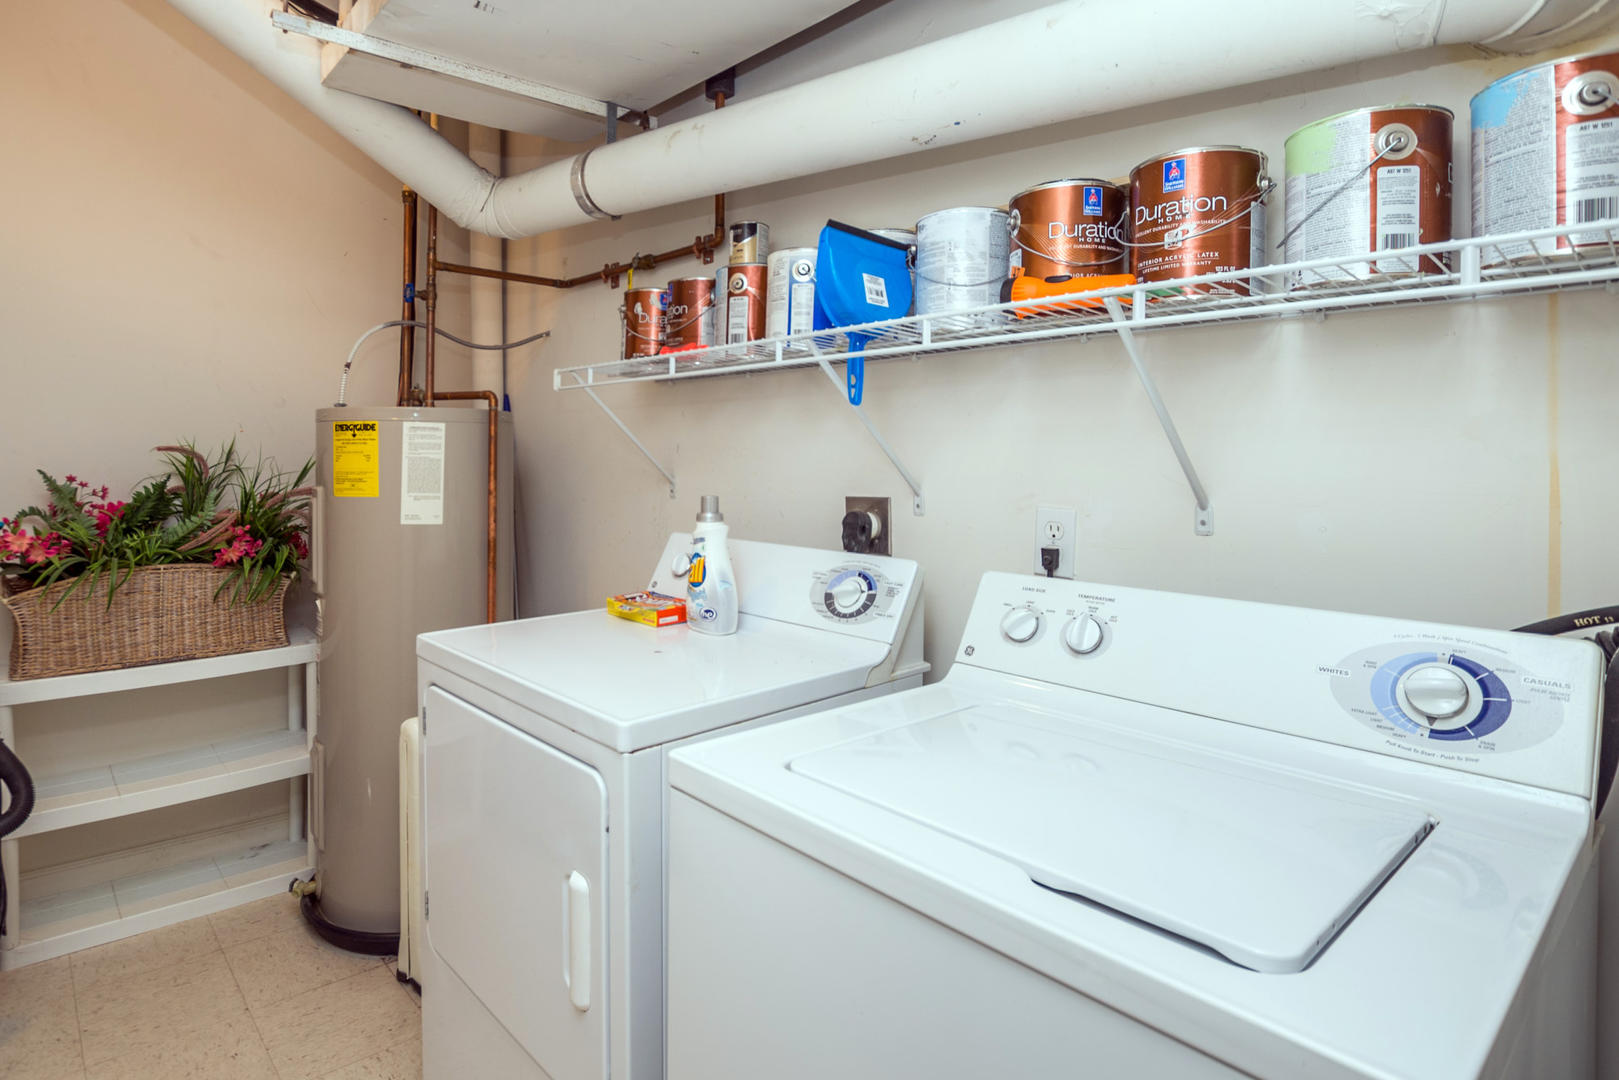 Maresol 309 - Laundry